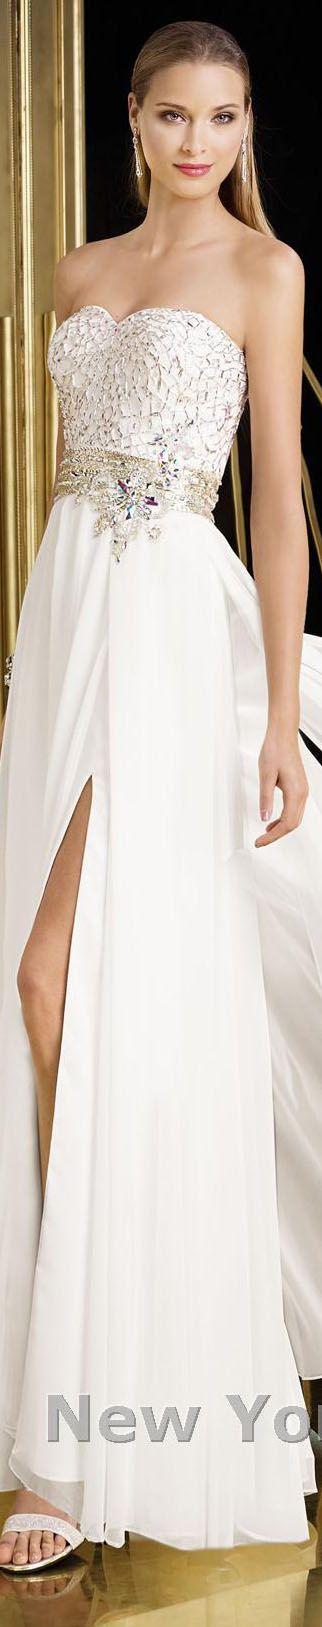 Alyce Paris design #strapless #elegant #large #formal #white #dress